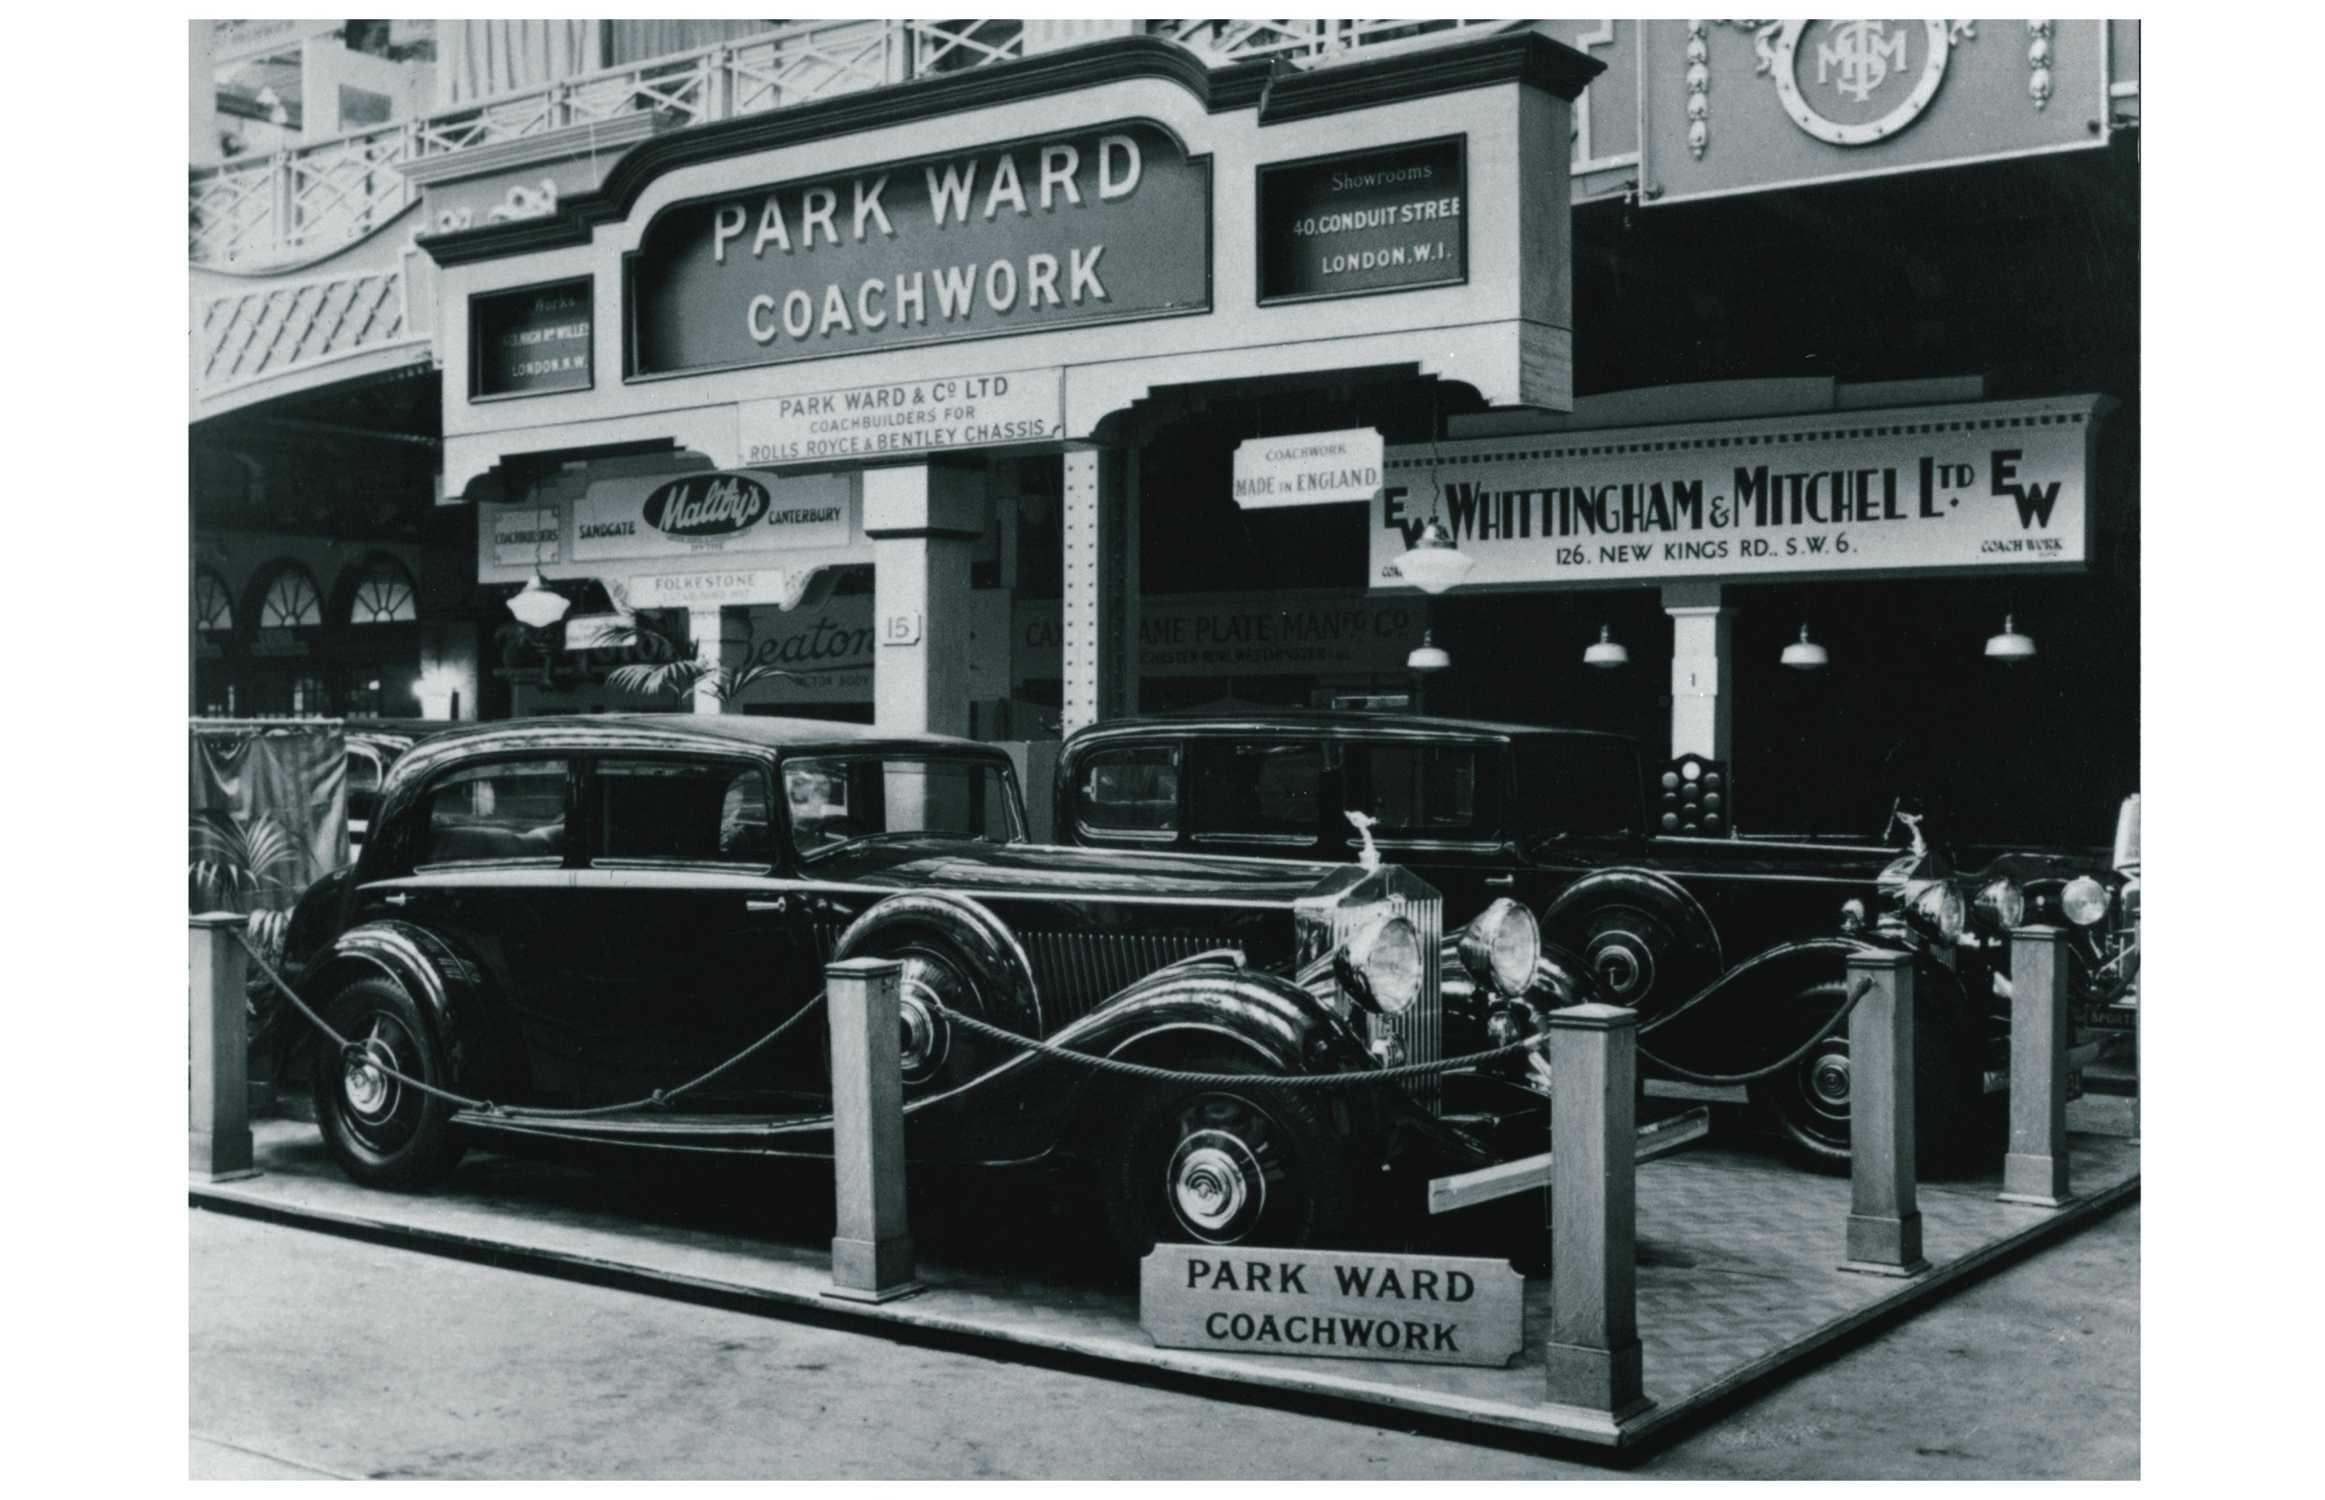 ROLLS-ROYCE PHANTOM II AT THE 1933 OLYMPIA MOTOR SHOW